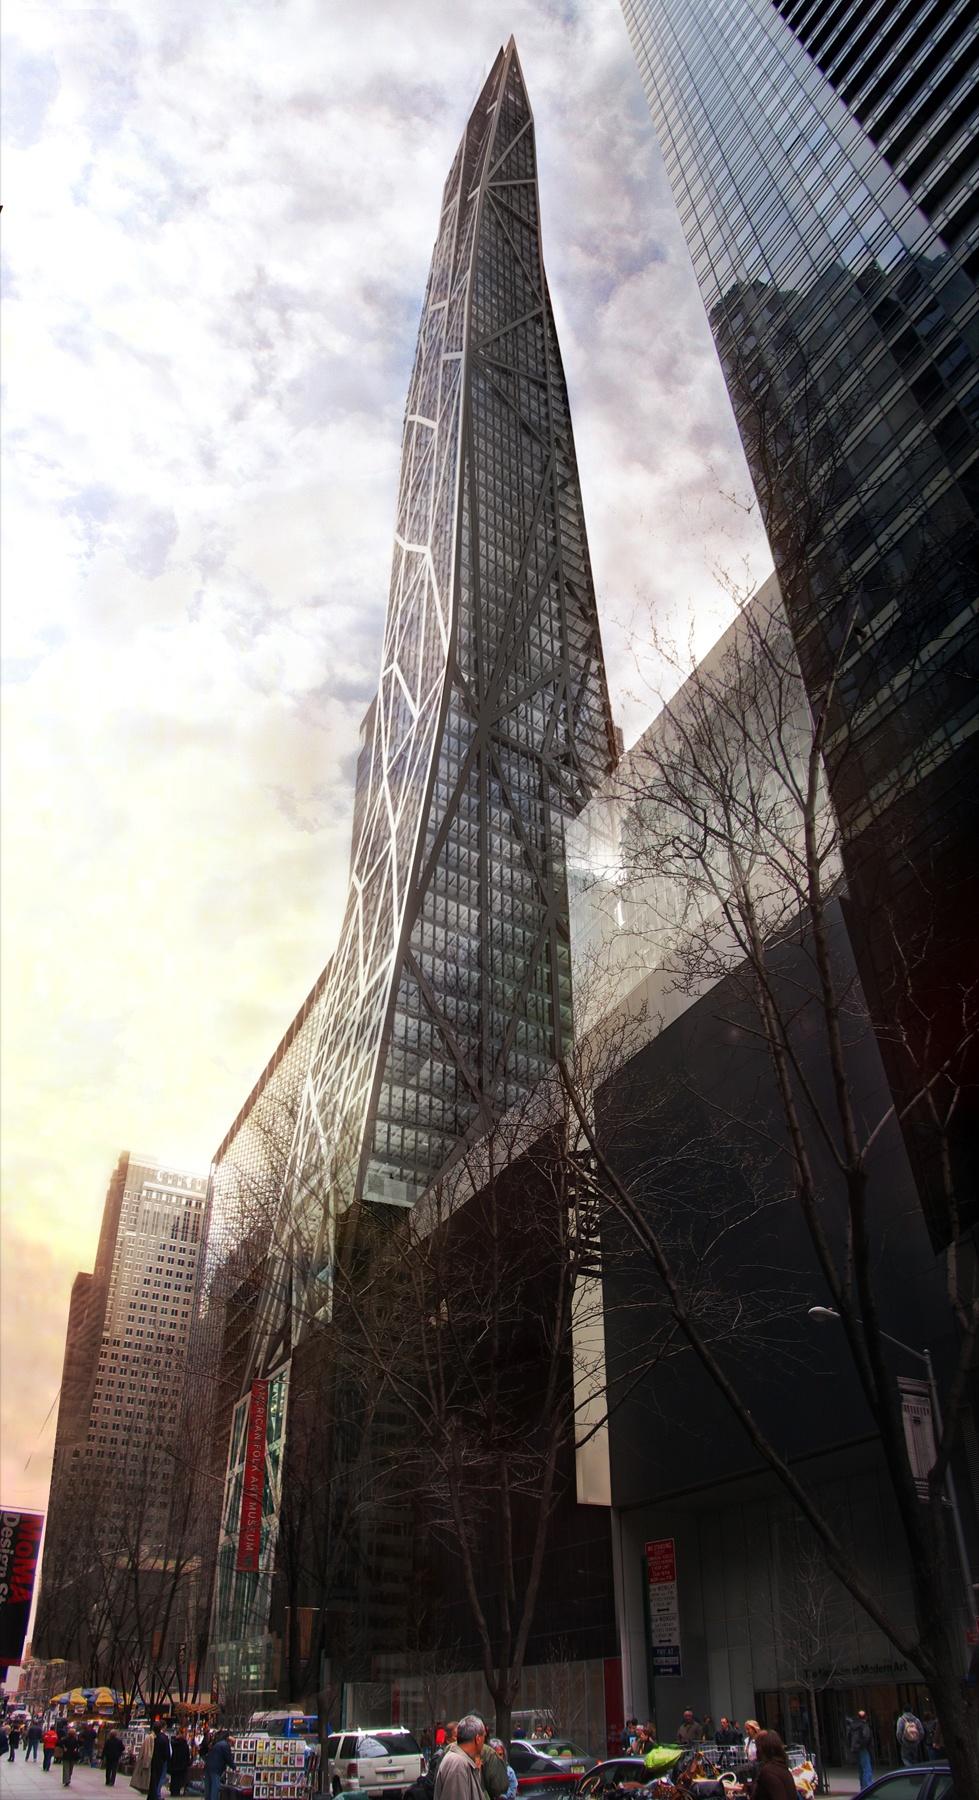 New york tower verre 53w53 320m 1050ft 77 fl u c skyscrapercity - Tour de verre marseille ...